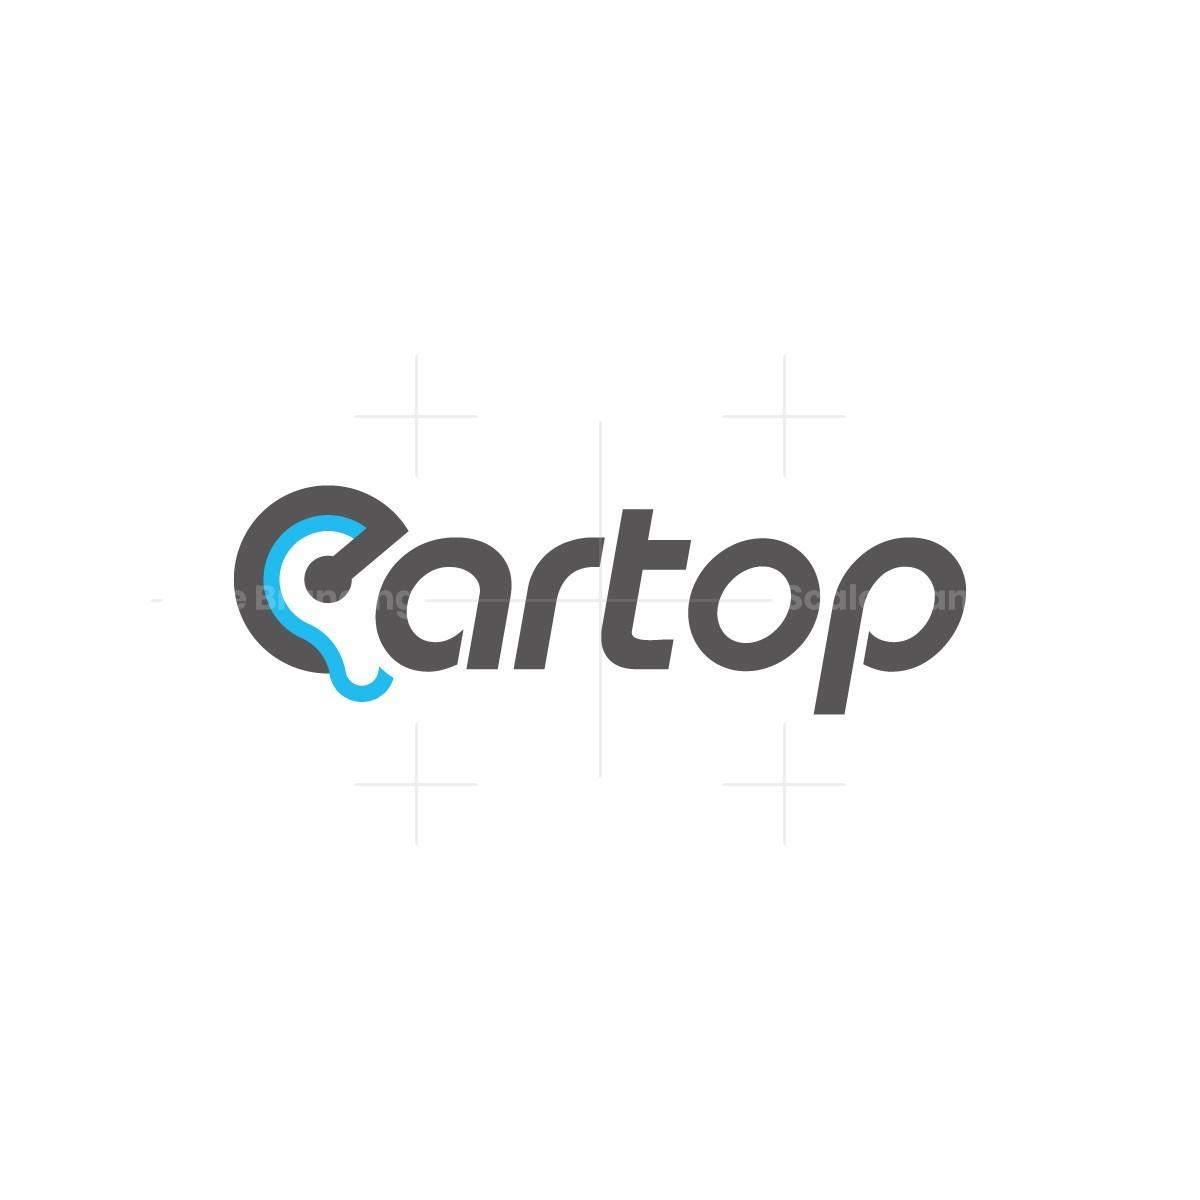 Ear Top Logo